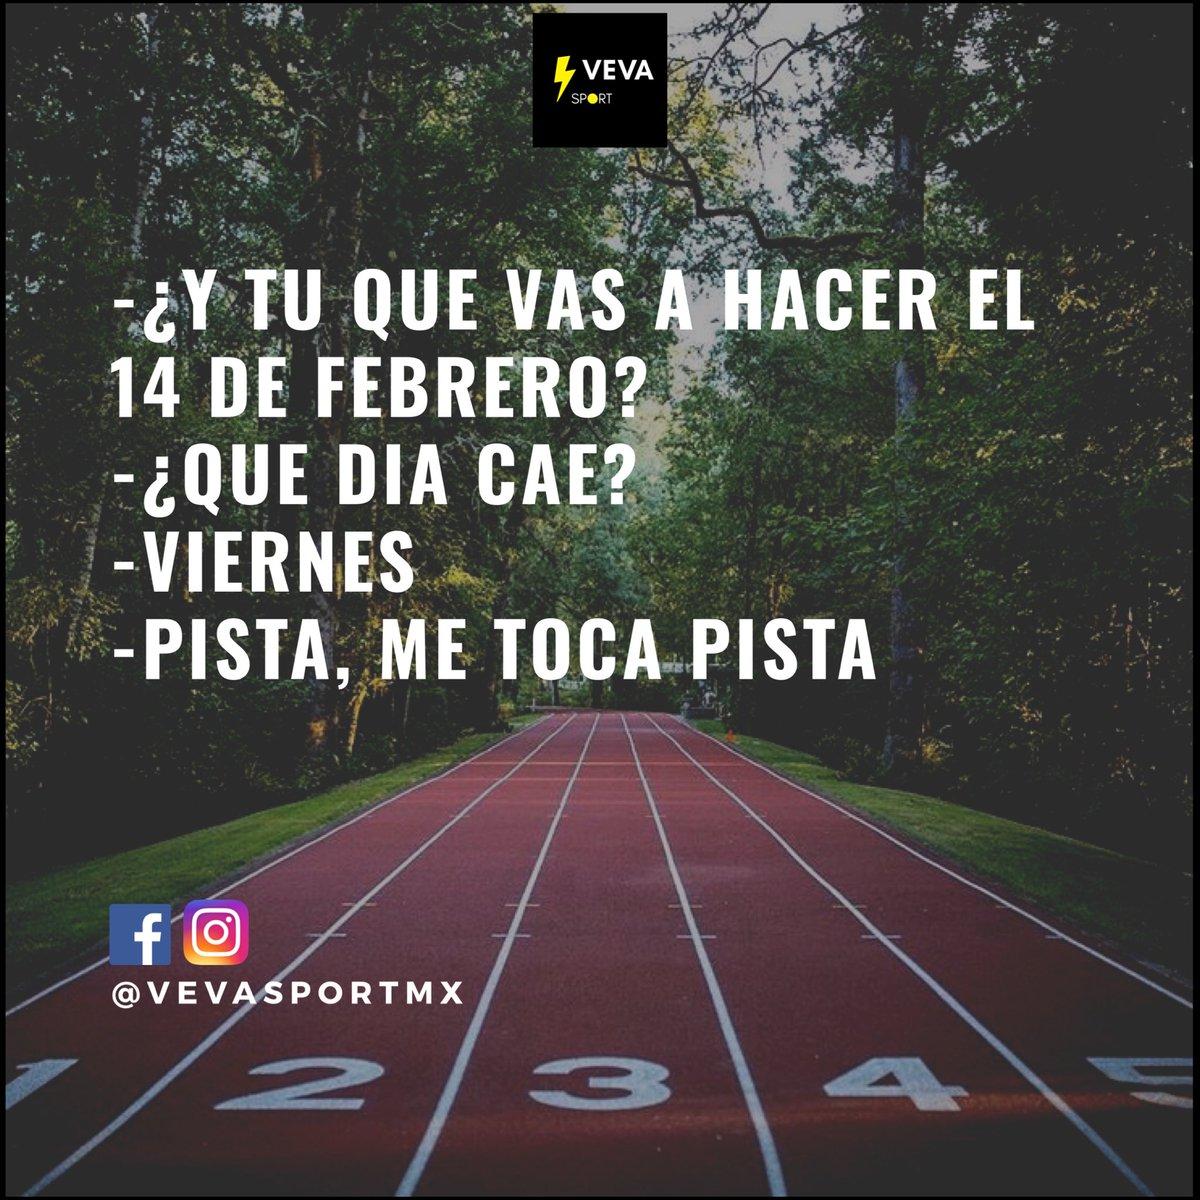 Y si... toca pista #soycorredora @LoveRunSmile @EntreRunners #CorrerEsMiPasion #corrermehaensenado #YoElegiCorrer #SanValentin2020 #SanValentin #VevaSport pic.twitter.com/j9RtmFUbyY